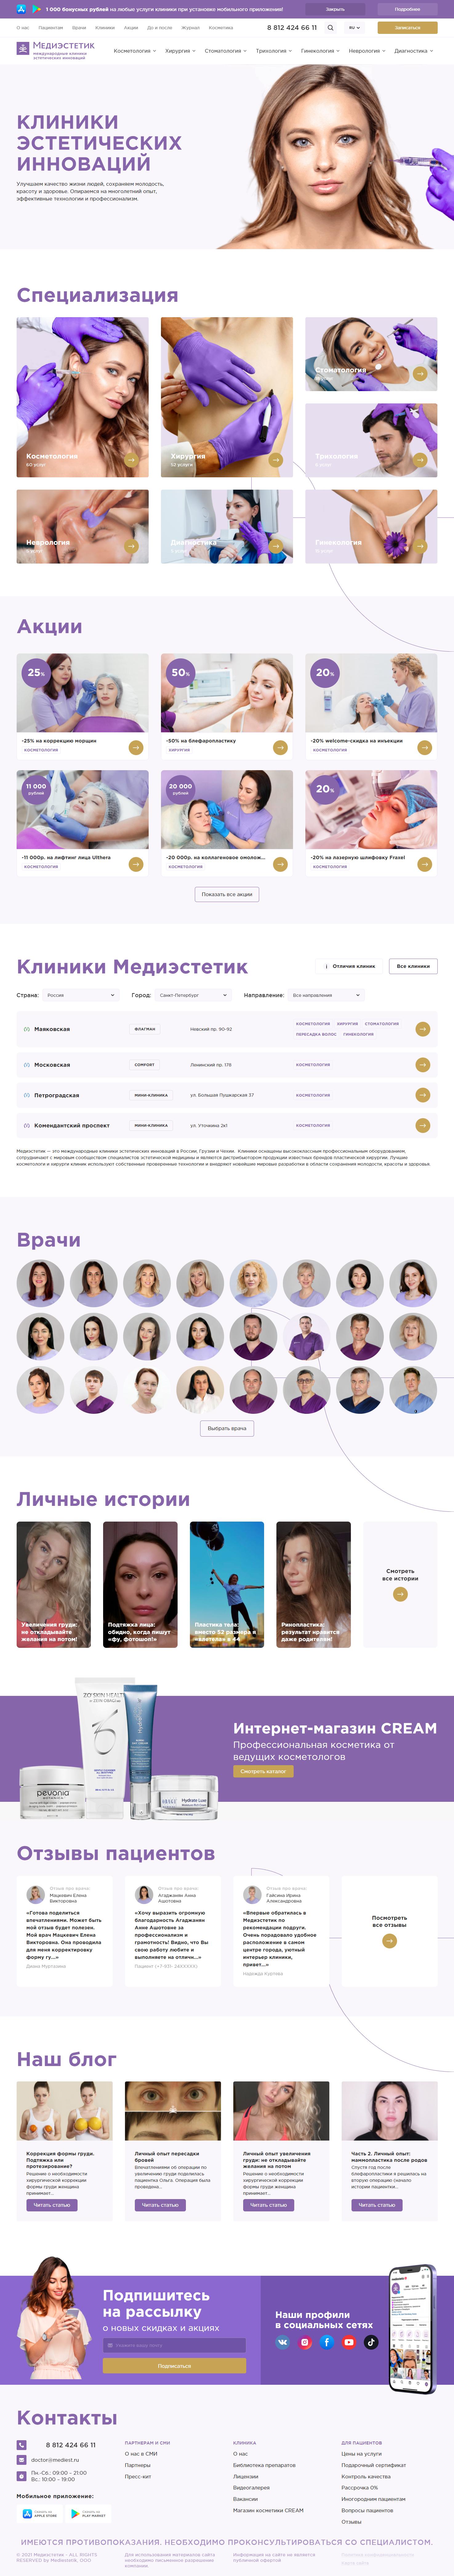 https://aleksinsky.ru/wp-content/uploads/2019/07/FireShot-Capture-051-Klinika-plasticheskoj-hirurgii-i-kosmetologii-v-Sankt-Peterburge-SPb_-mediest.ru_.png